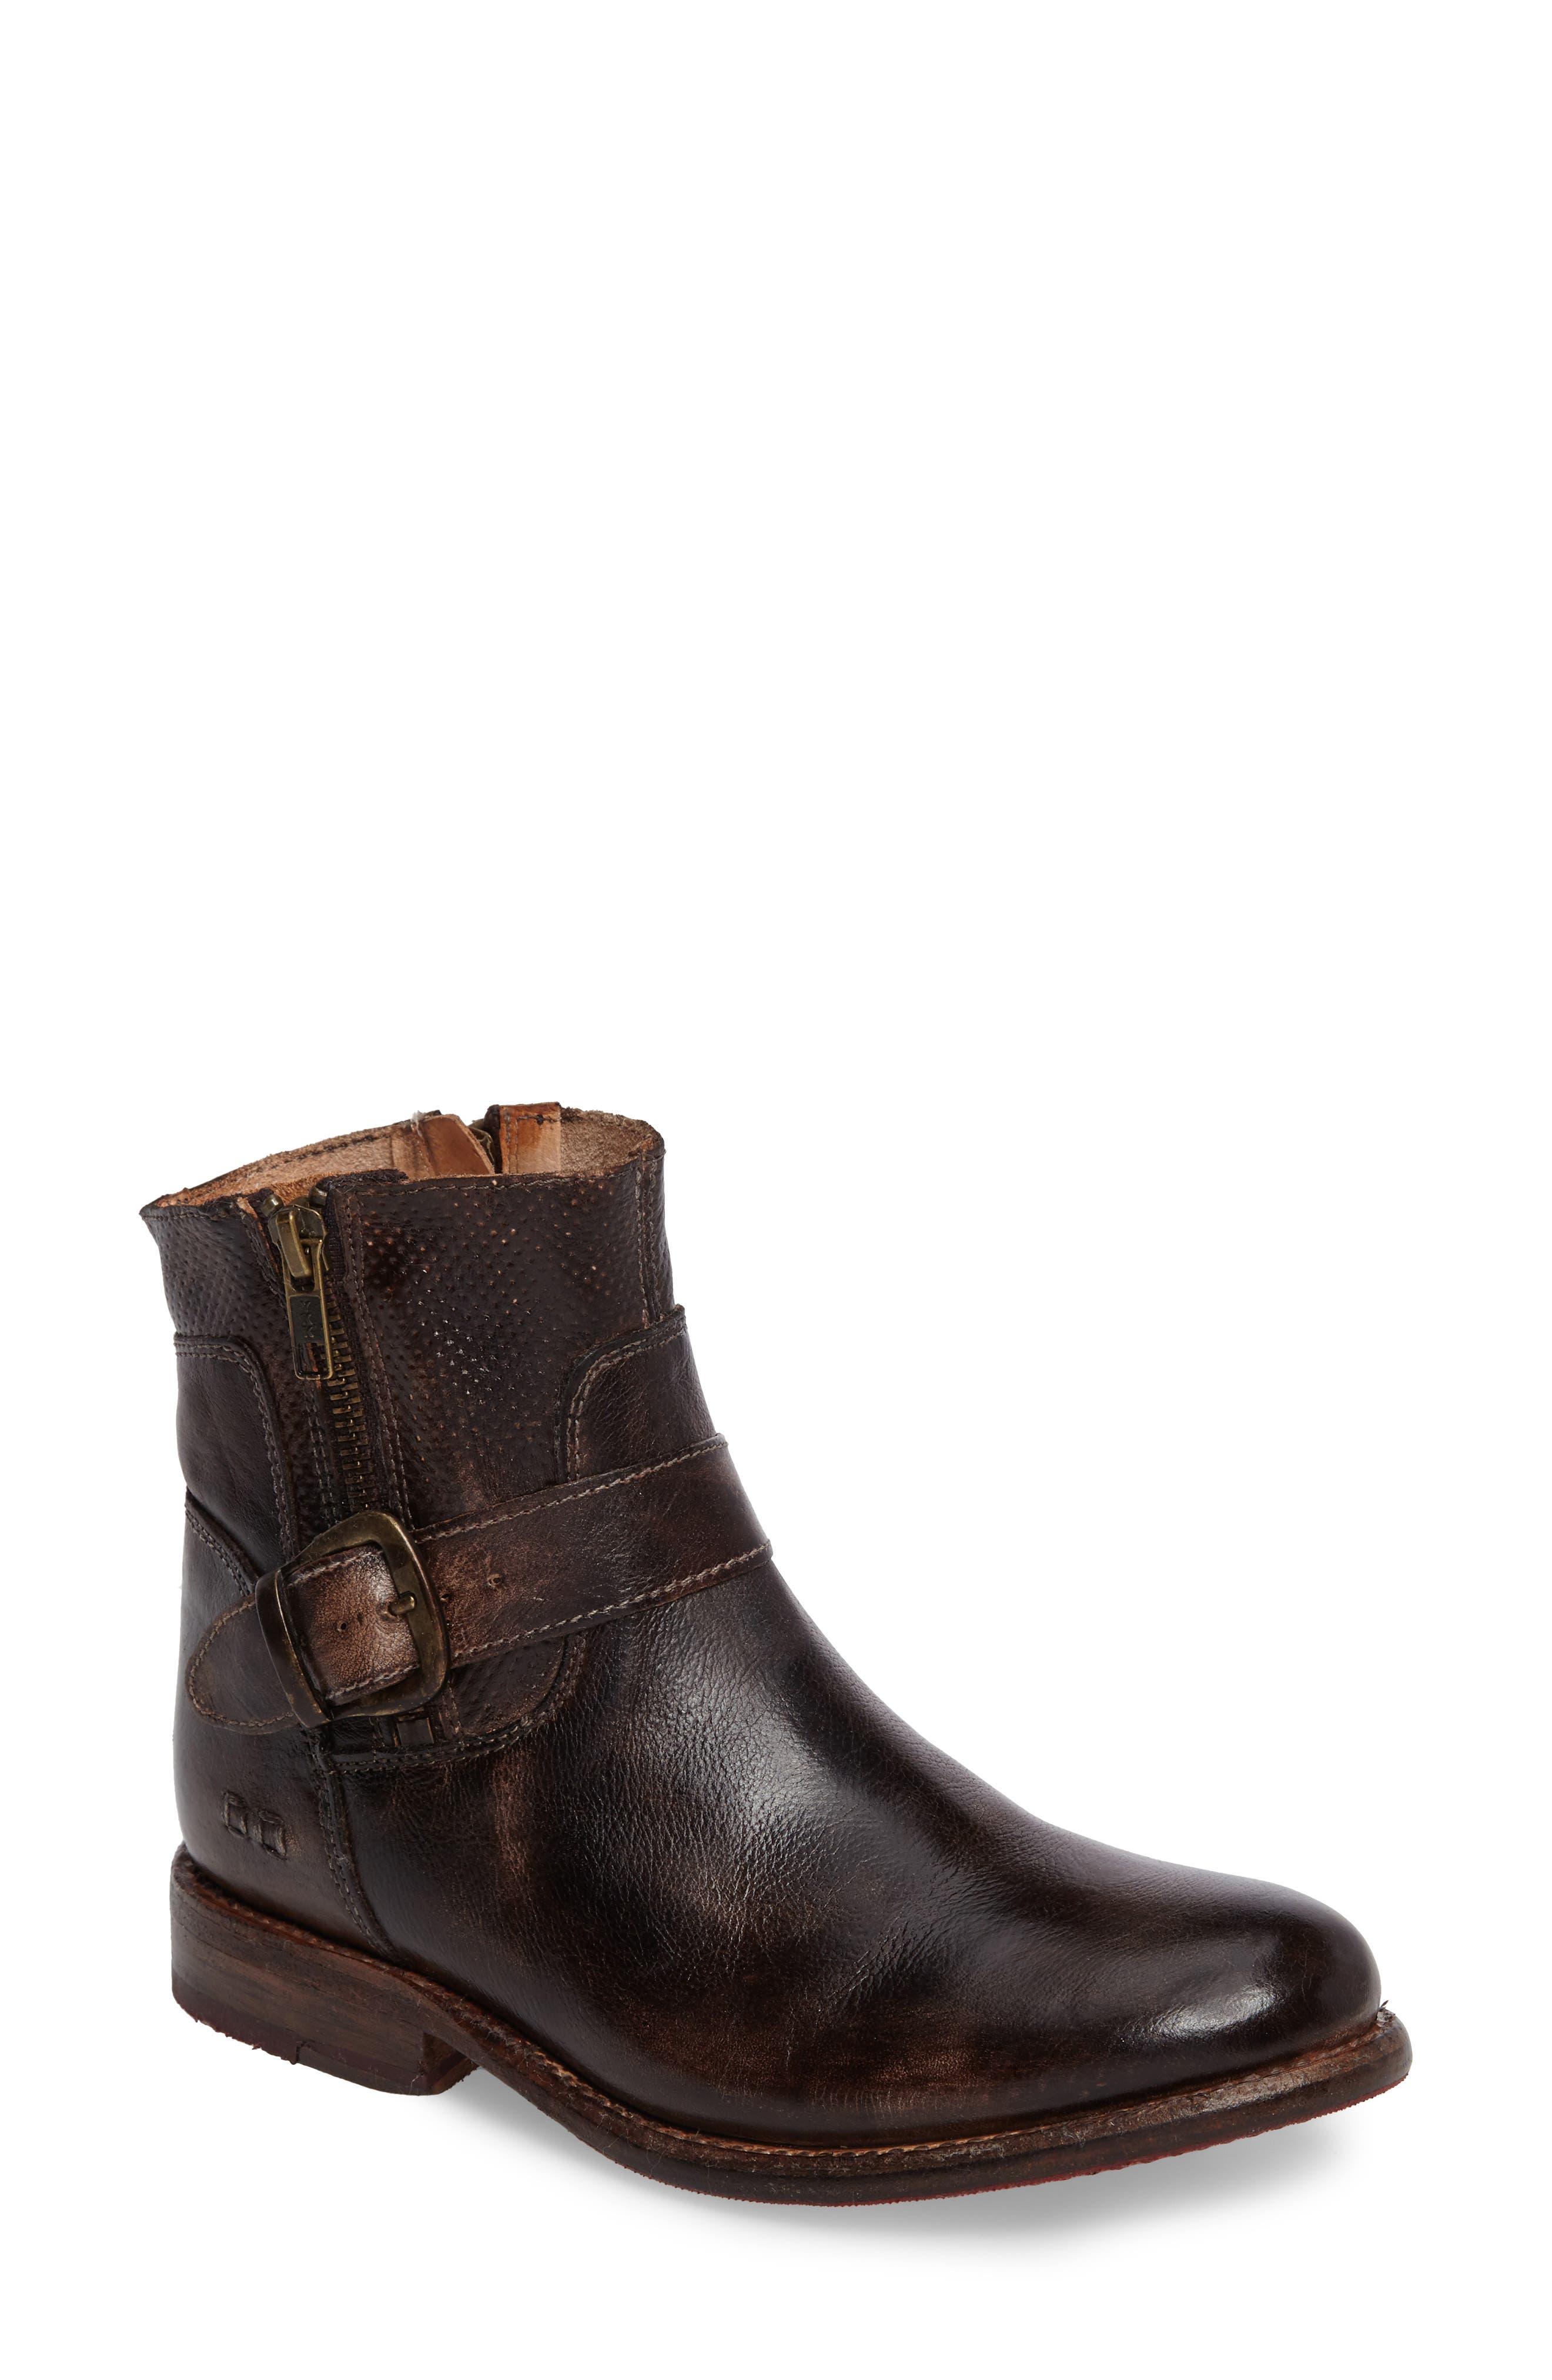 Becca Buckle Boot,                         Main,                         color, Testa Di Moro Rustic